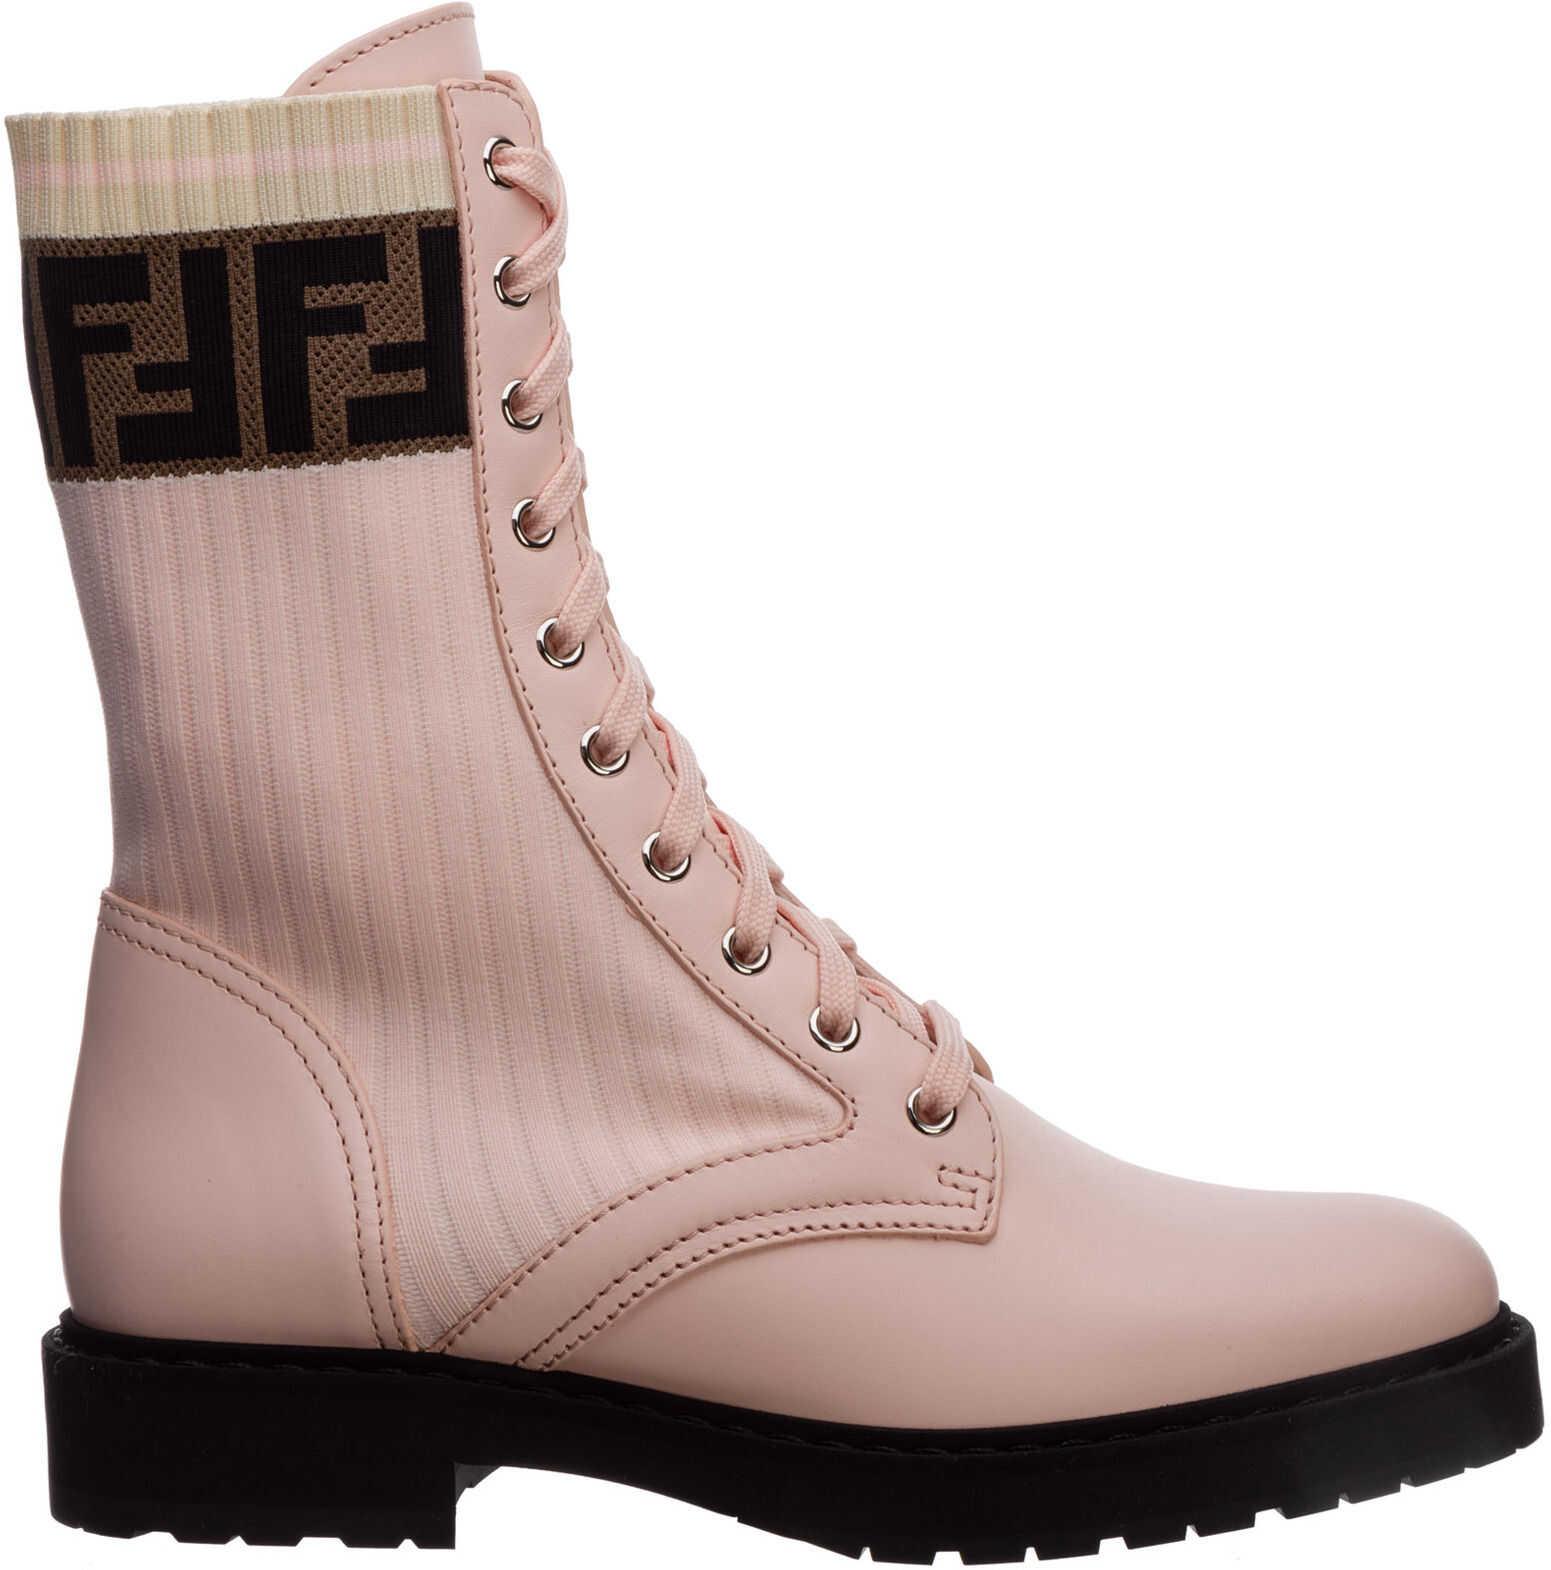 Fendi Boots Booties 8T6780A3H4F1C3A Pink imagine b-mall.ro